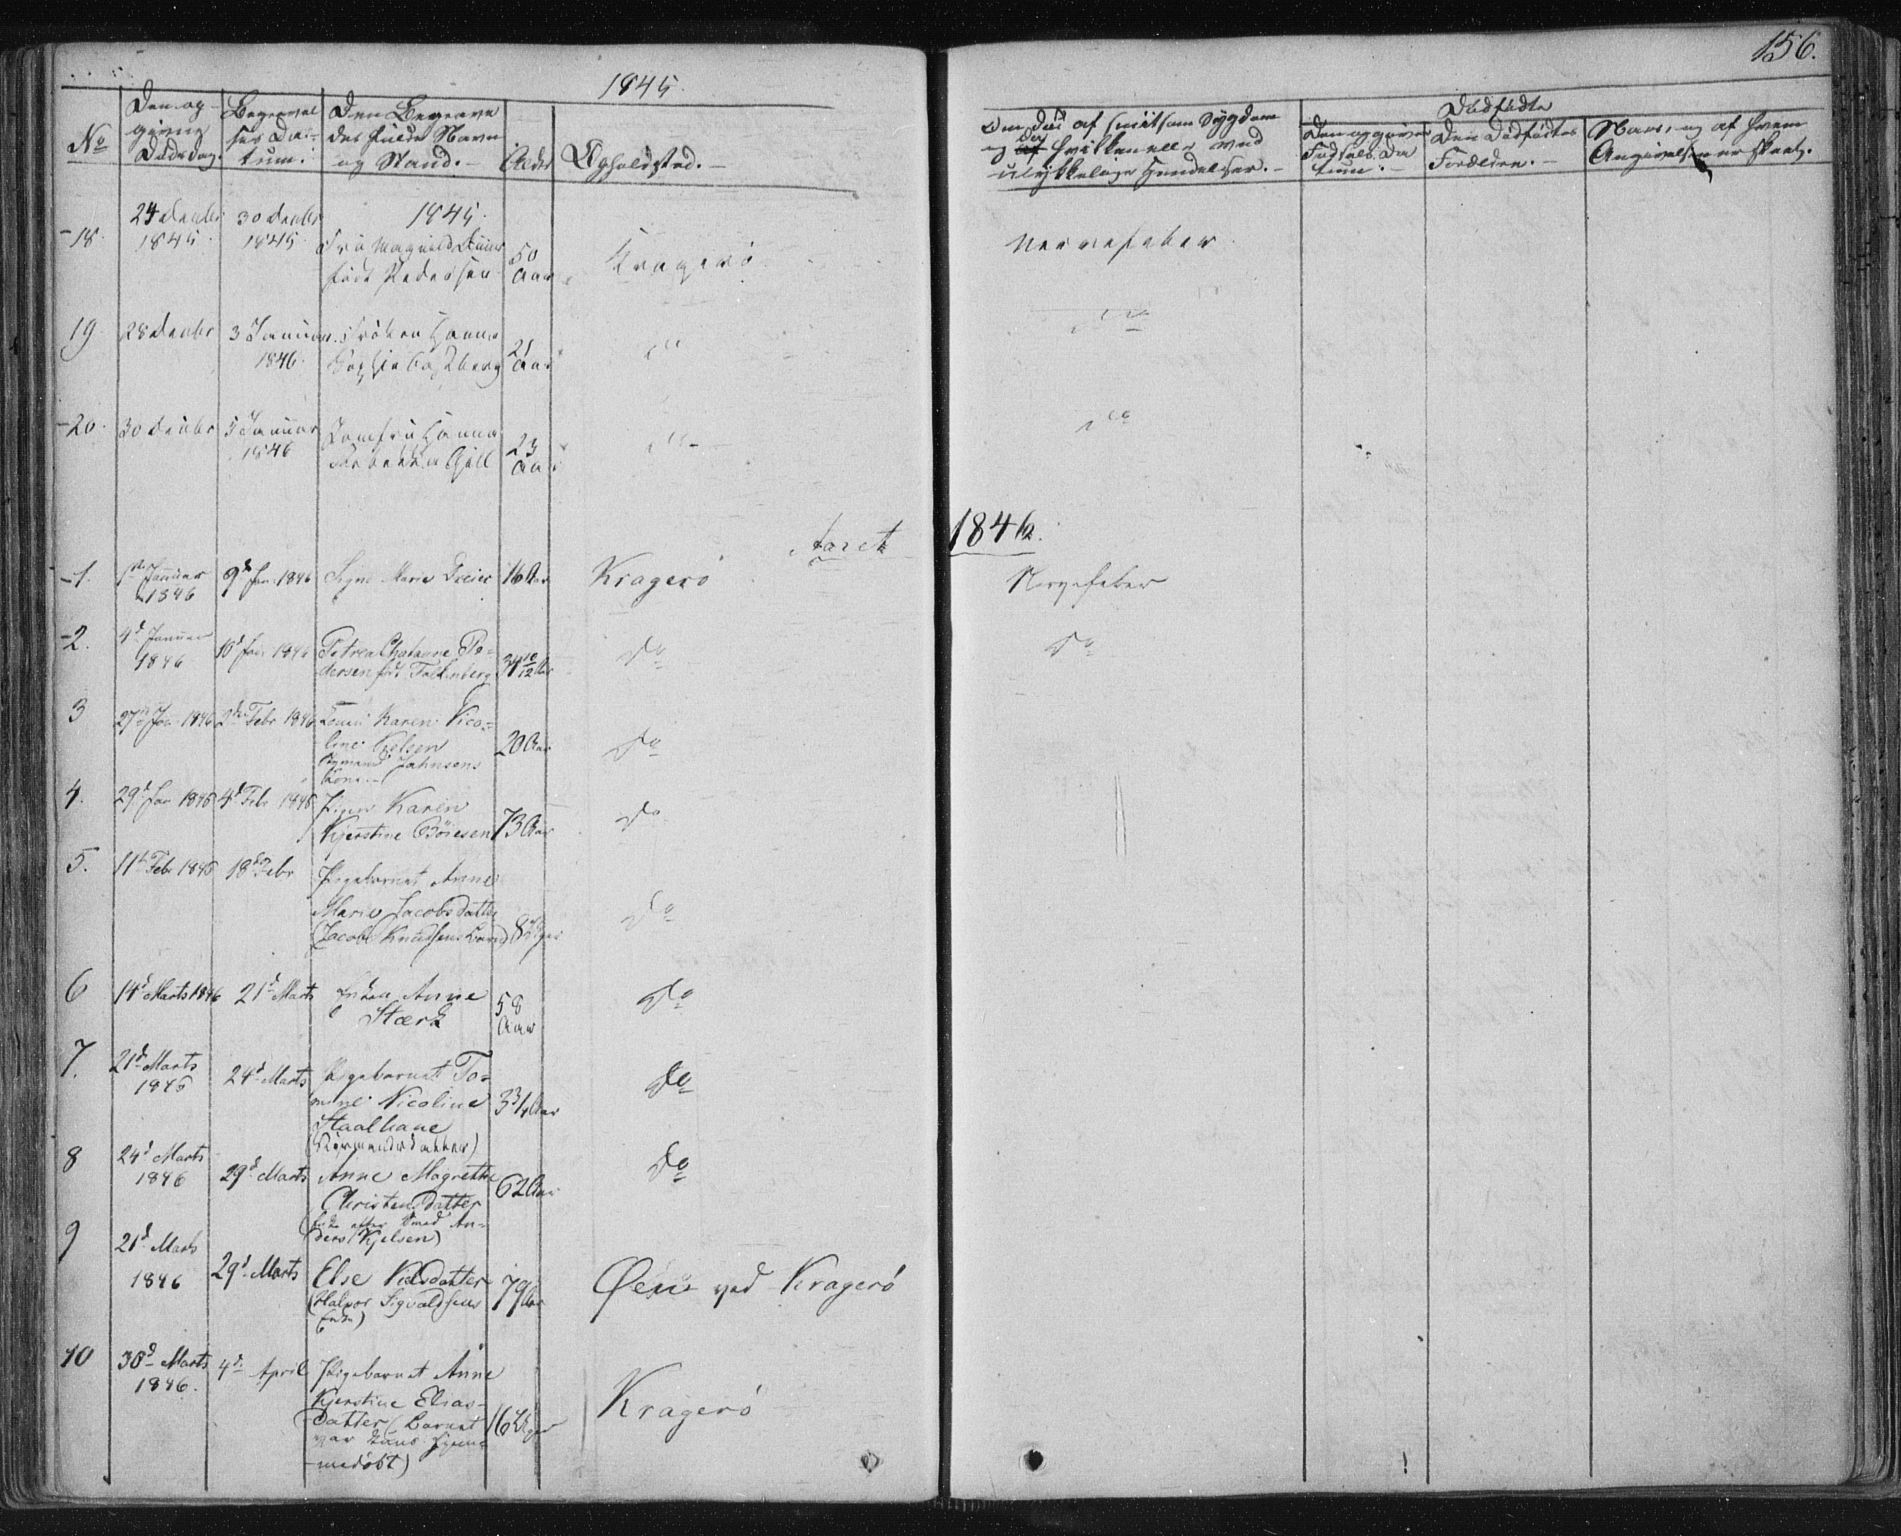 SAKO, Kragerø kirkebøker, F/Fa/L0005: Ministerialbok nr. 5, 1832-1847, s. 156